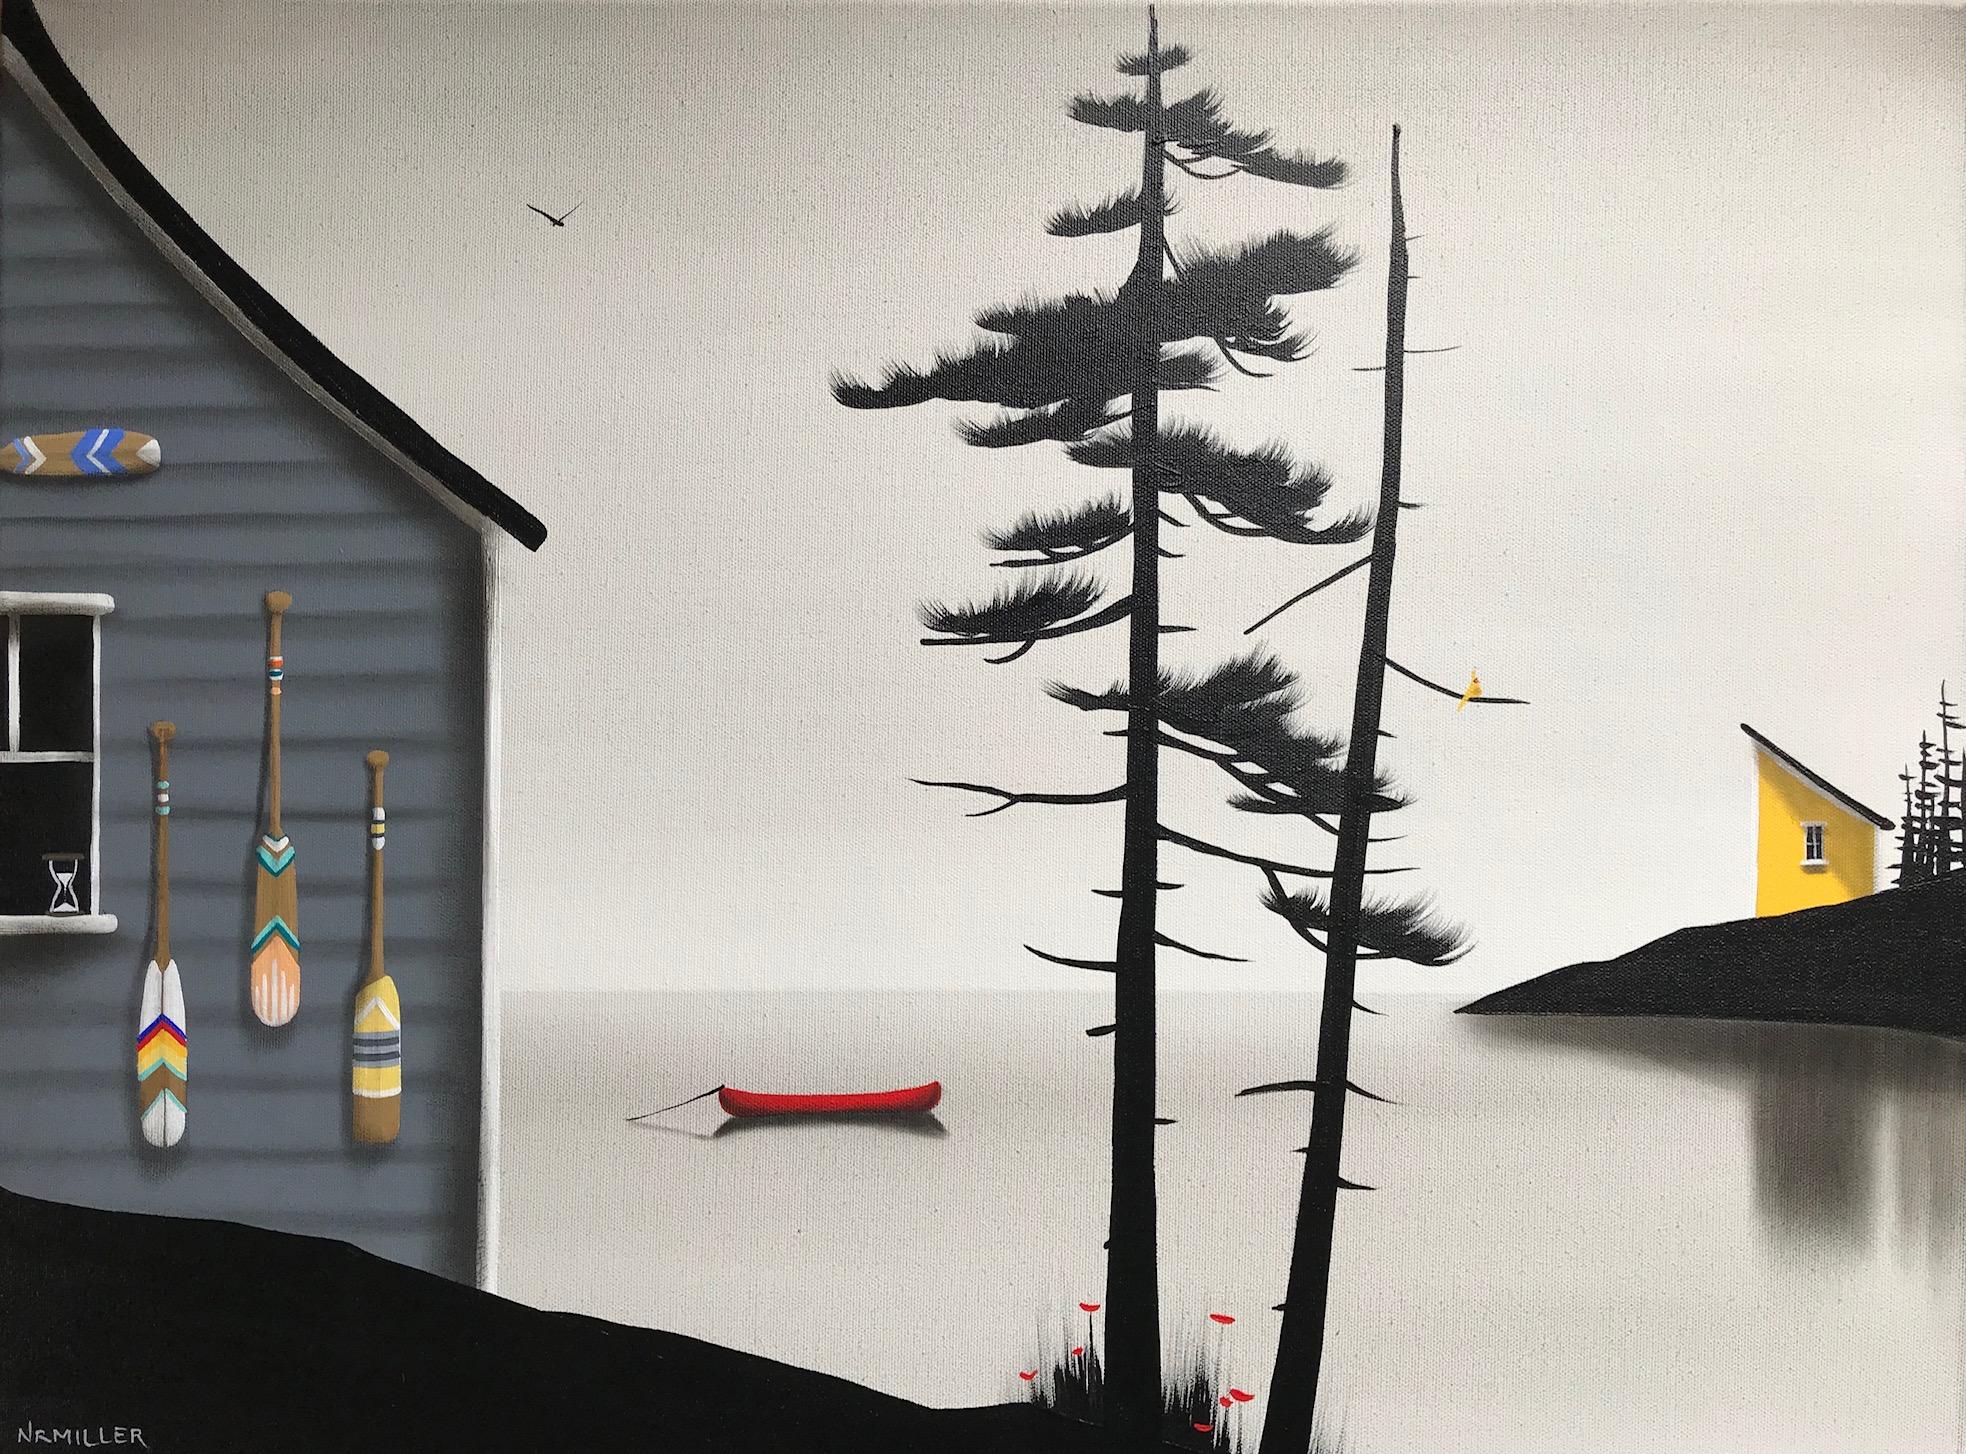 Precious Time, mixed media coastal landscape painting by Natasha Miller | Effusion Art Gallery + Cast Glass Studio, Invermere BC